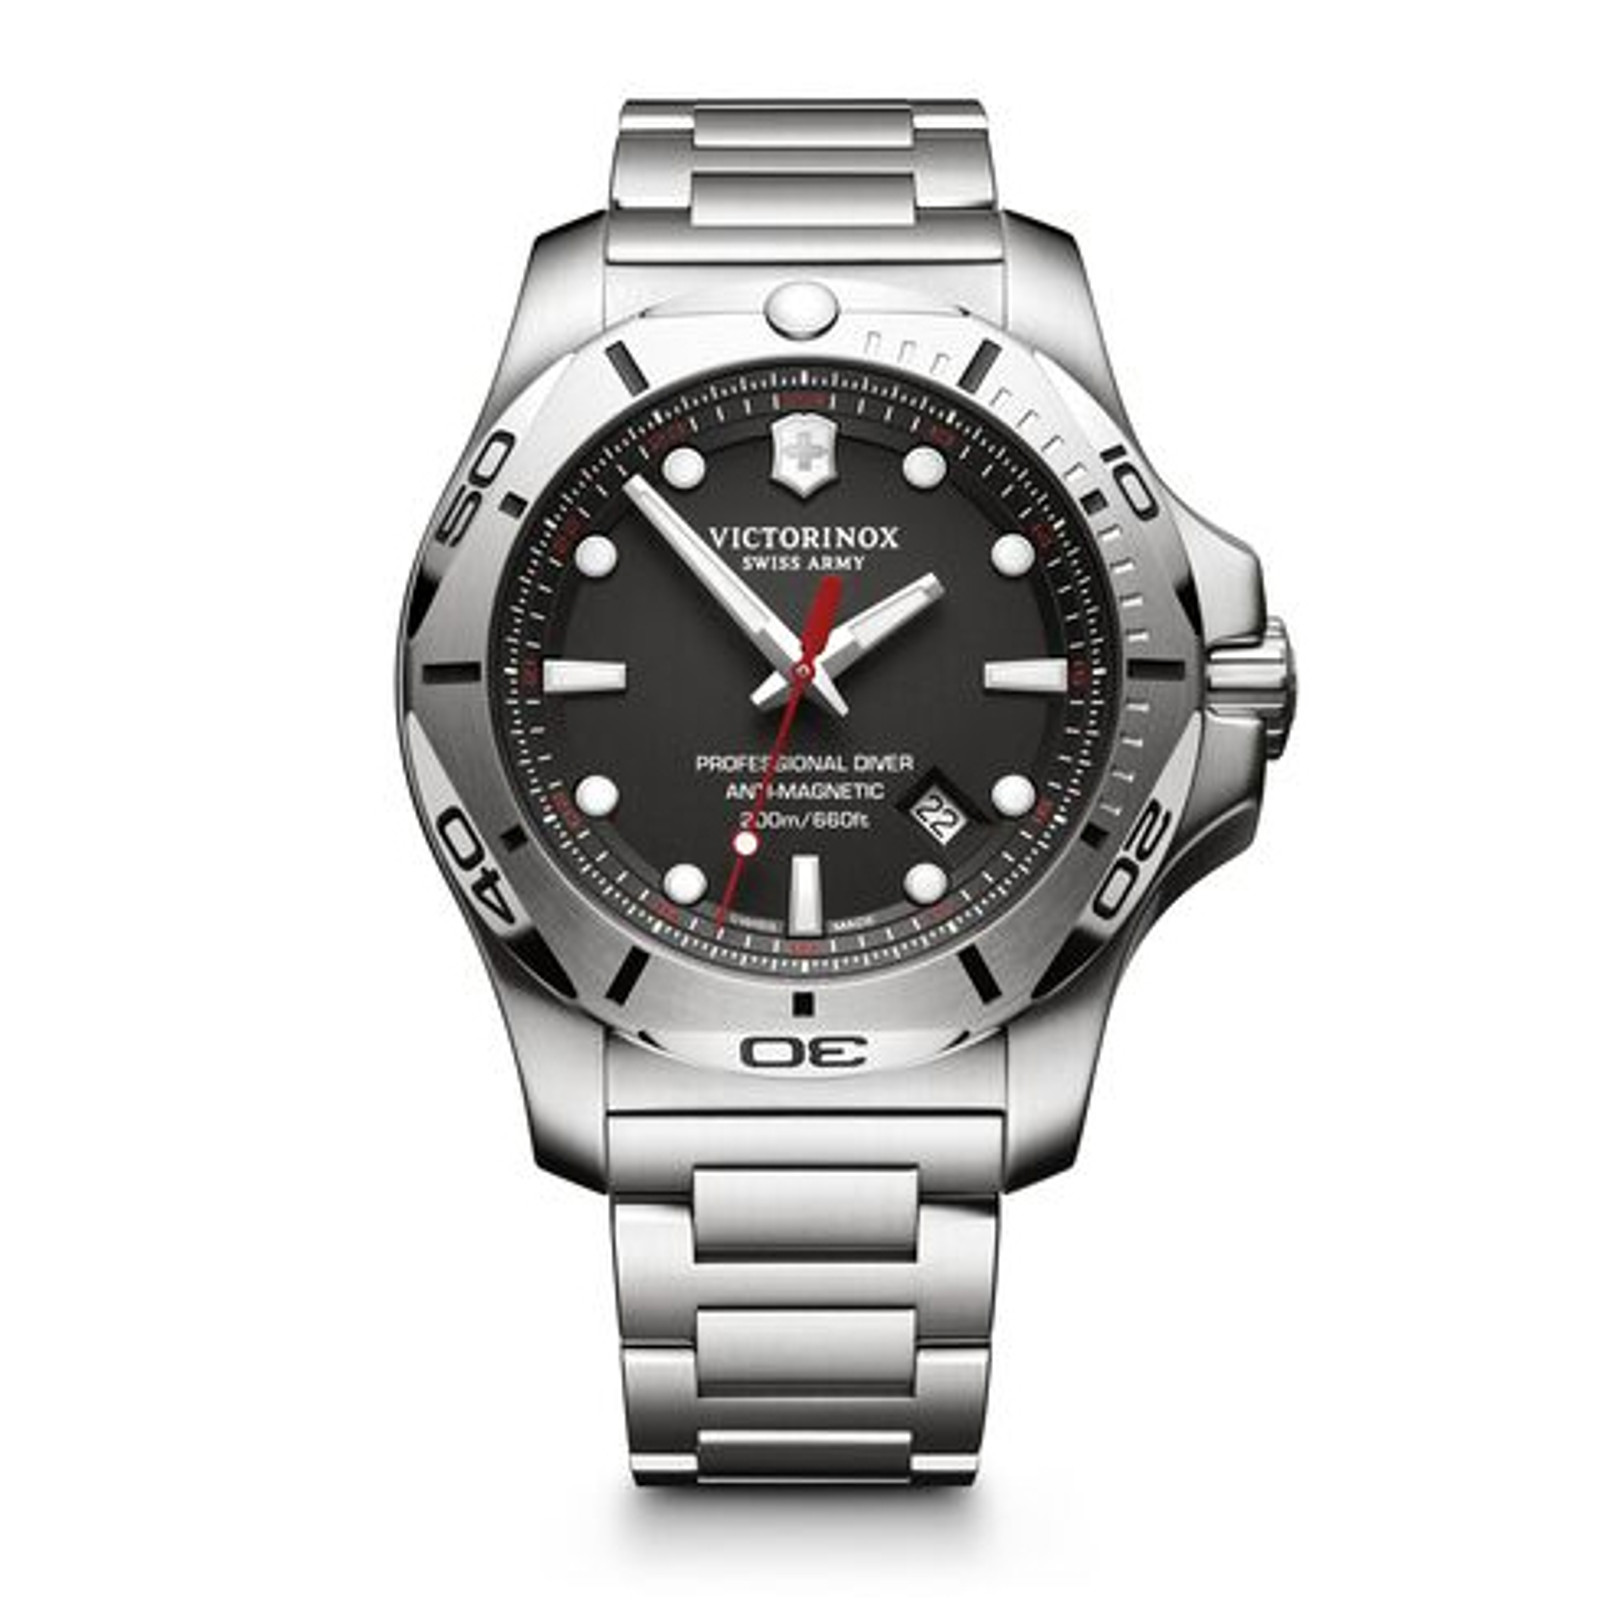 Victorinox Professional Diver (241781)